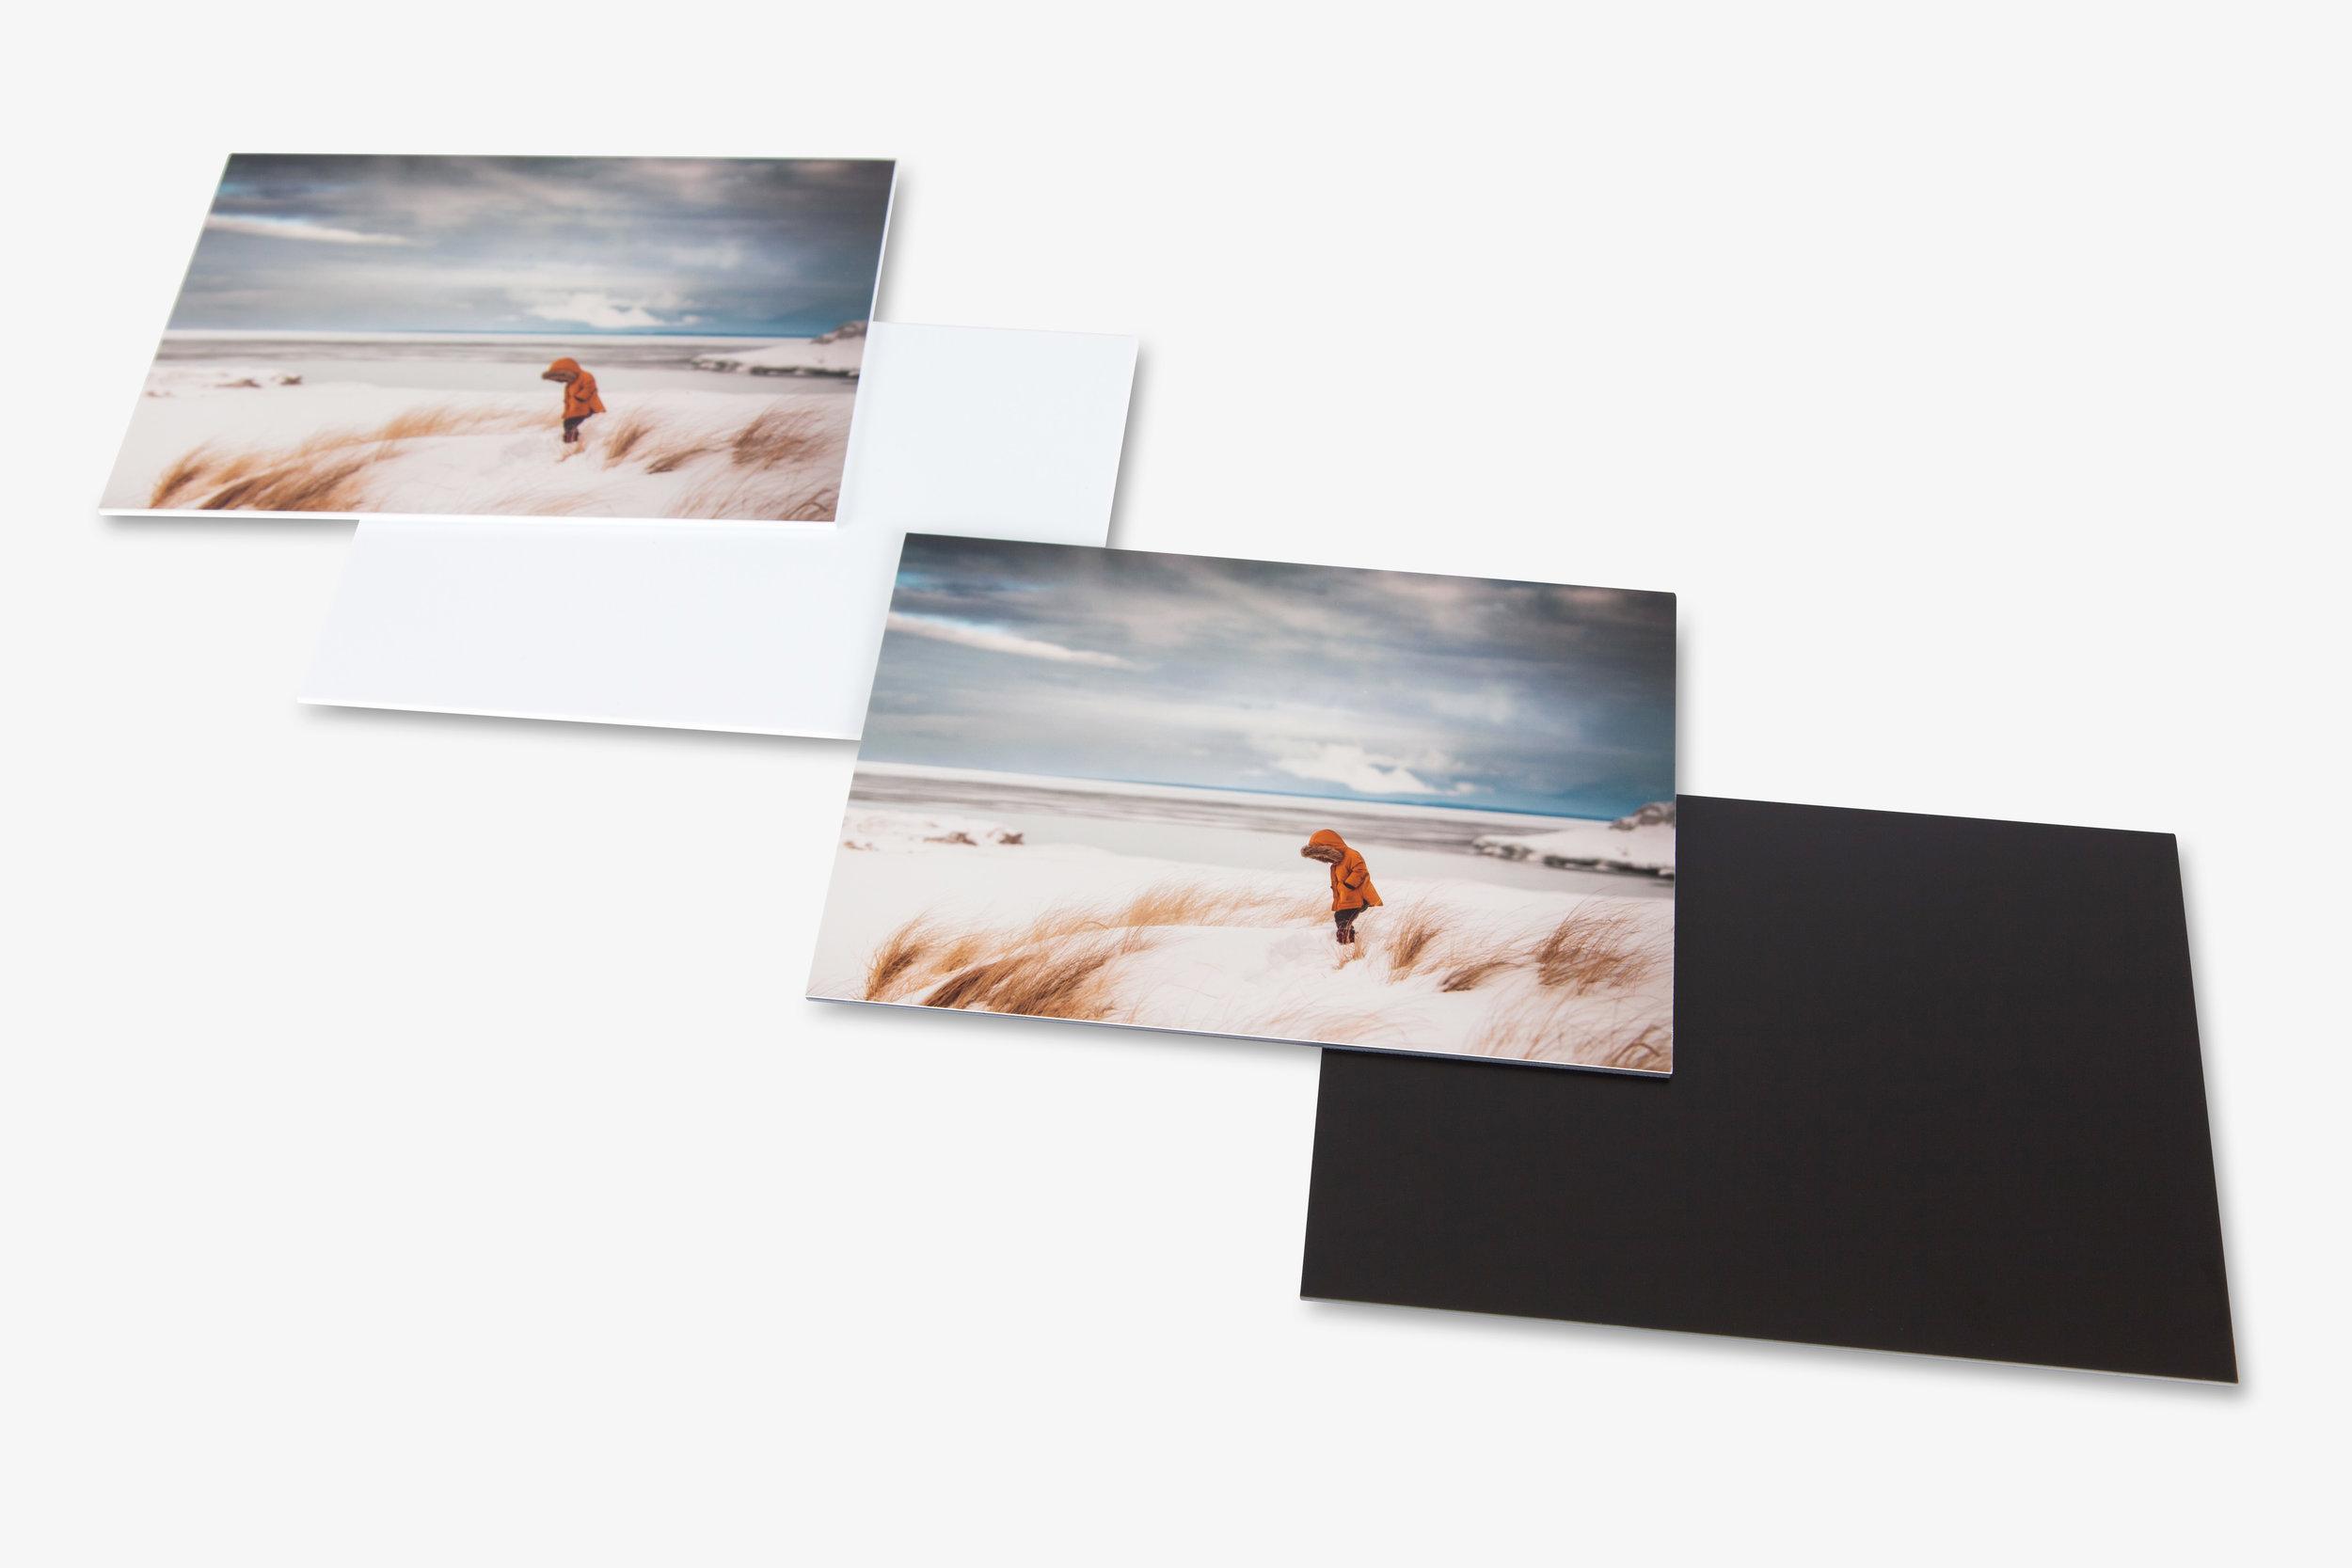 Styrene Mounted Photo Prints